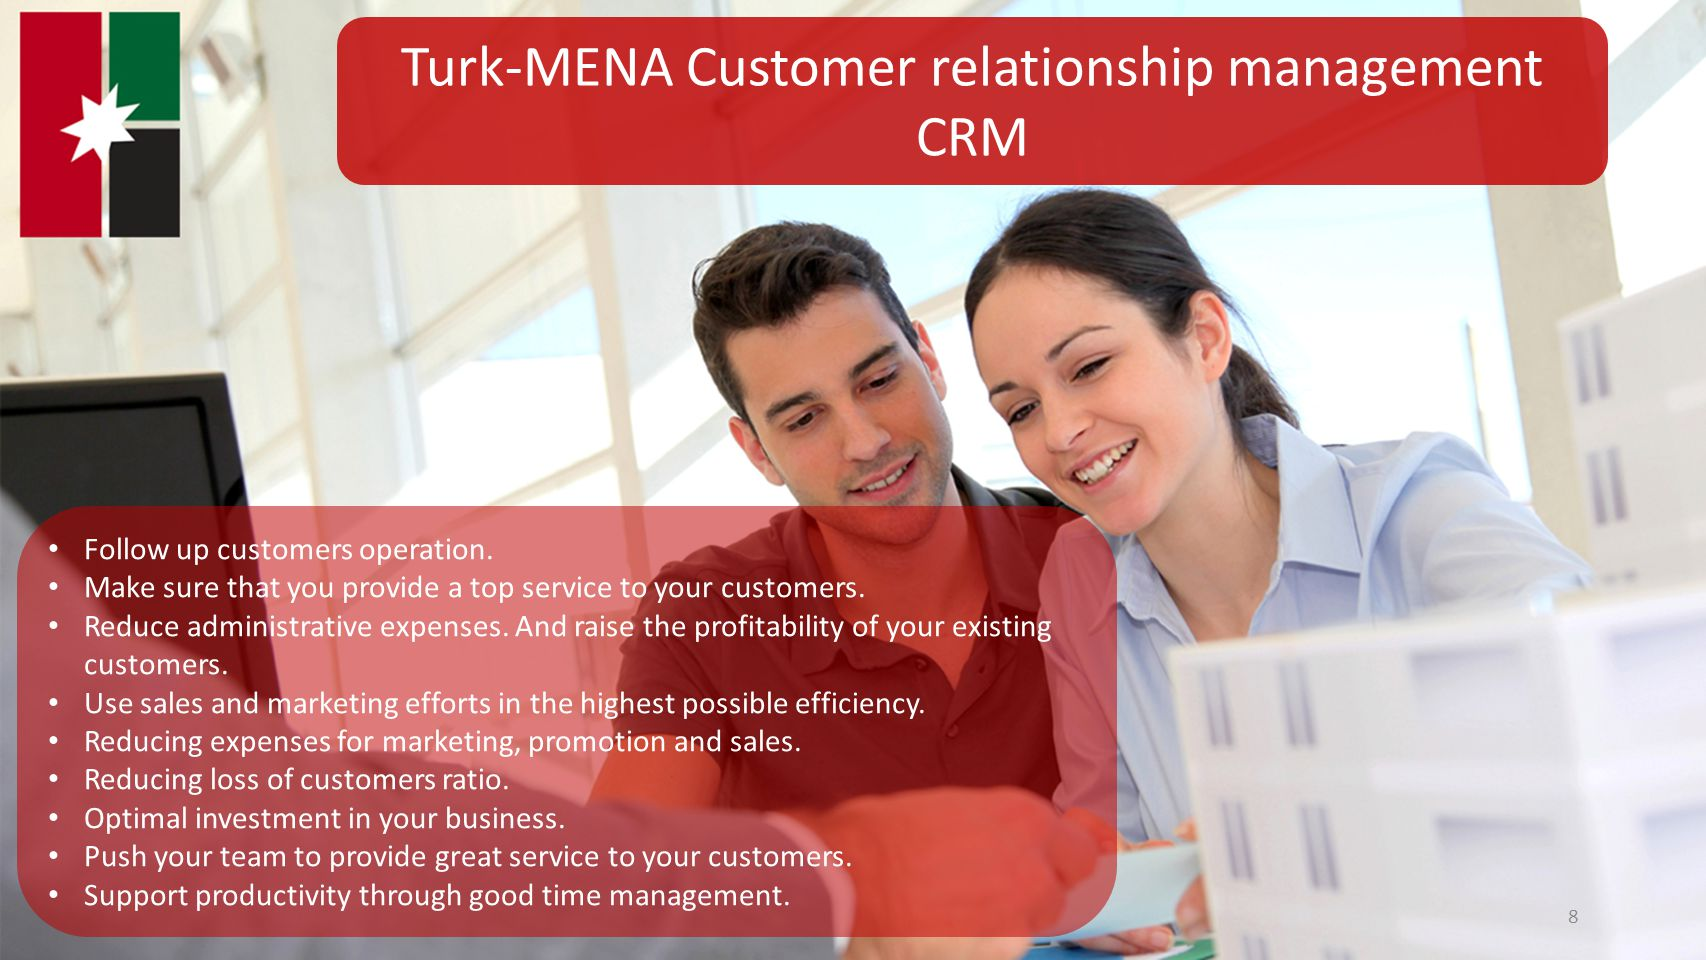 Turk-MENA Customer relationship management CRM